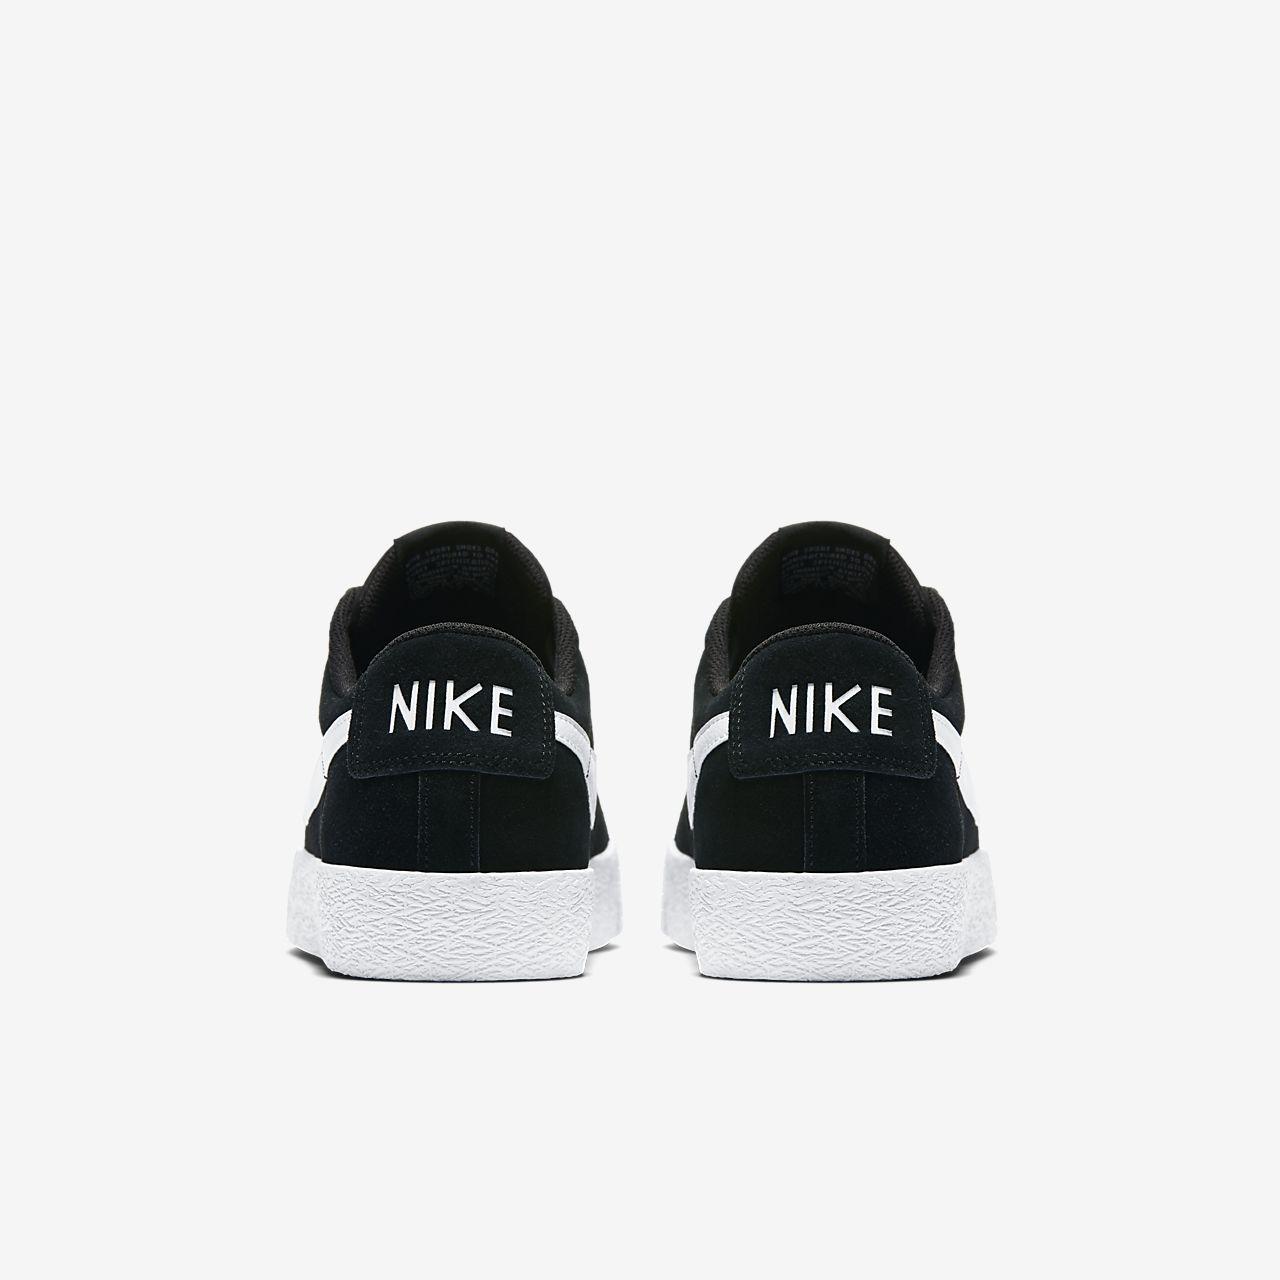 size 40 176a6 90ff9 ... Chaussure de skateboard Nike SB Blazer Zoom Low pour Homme